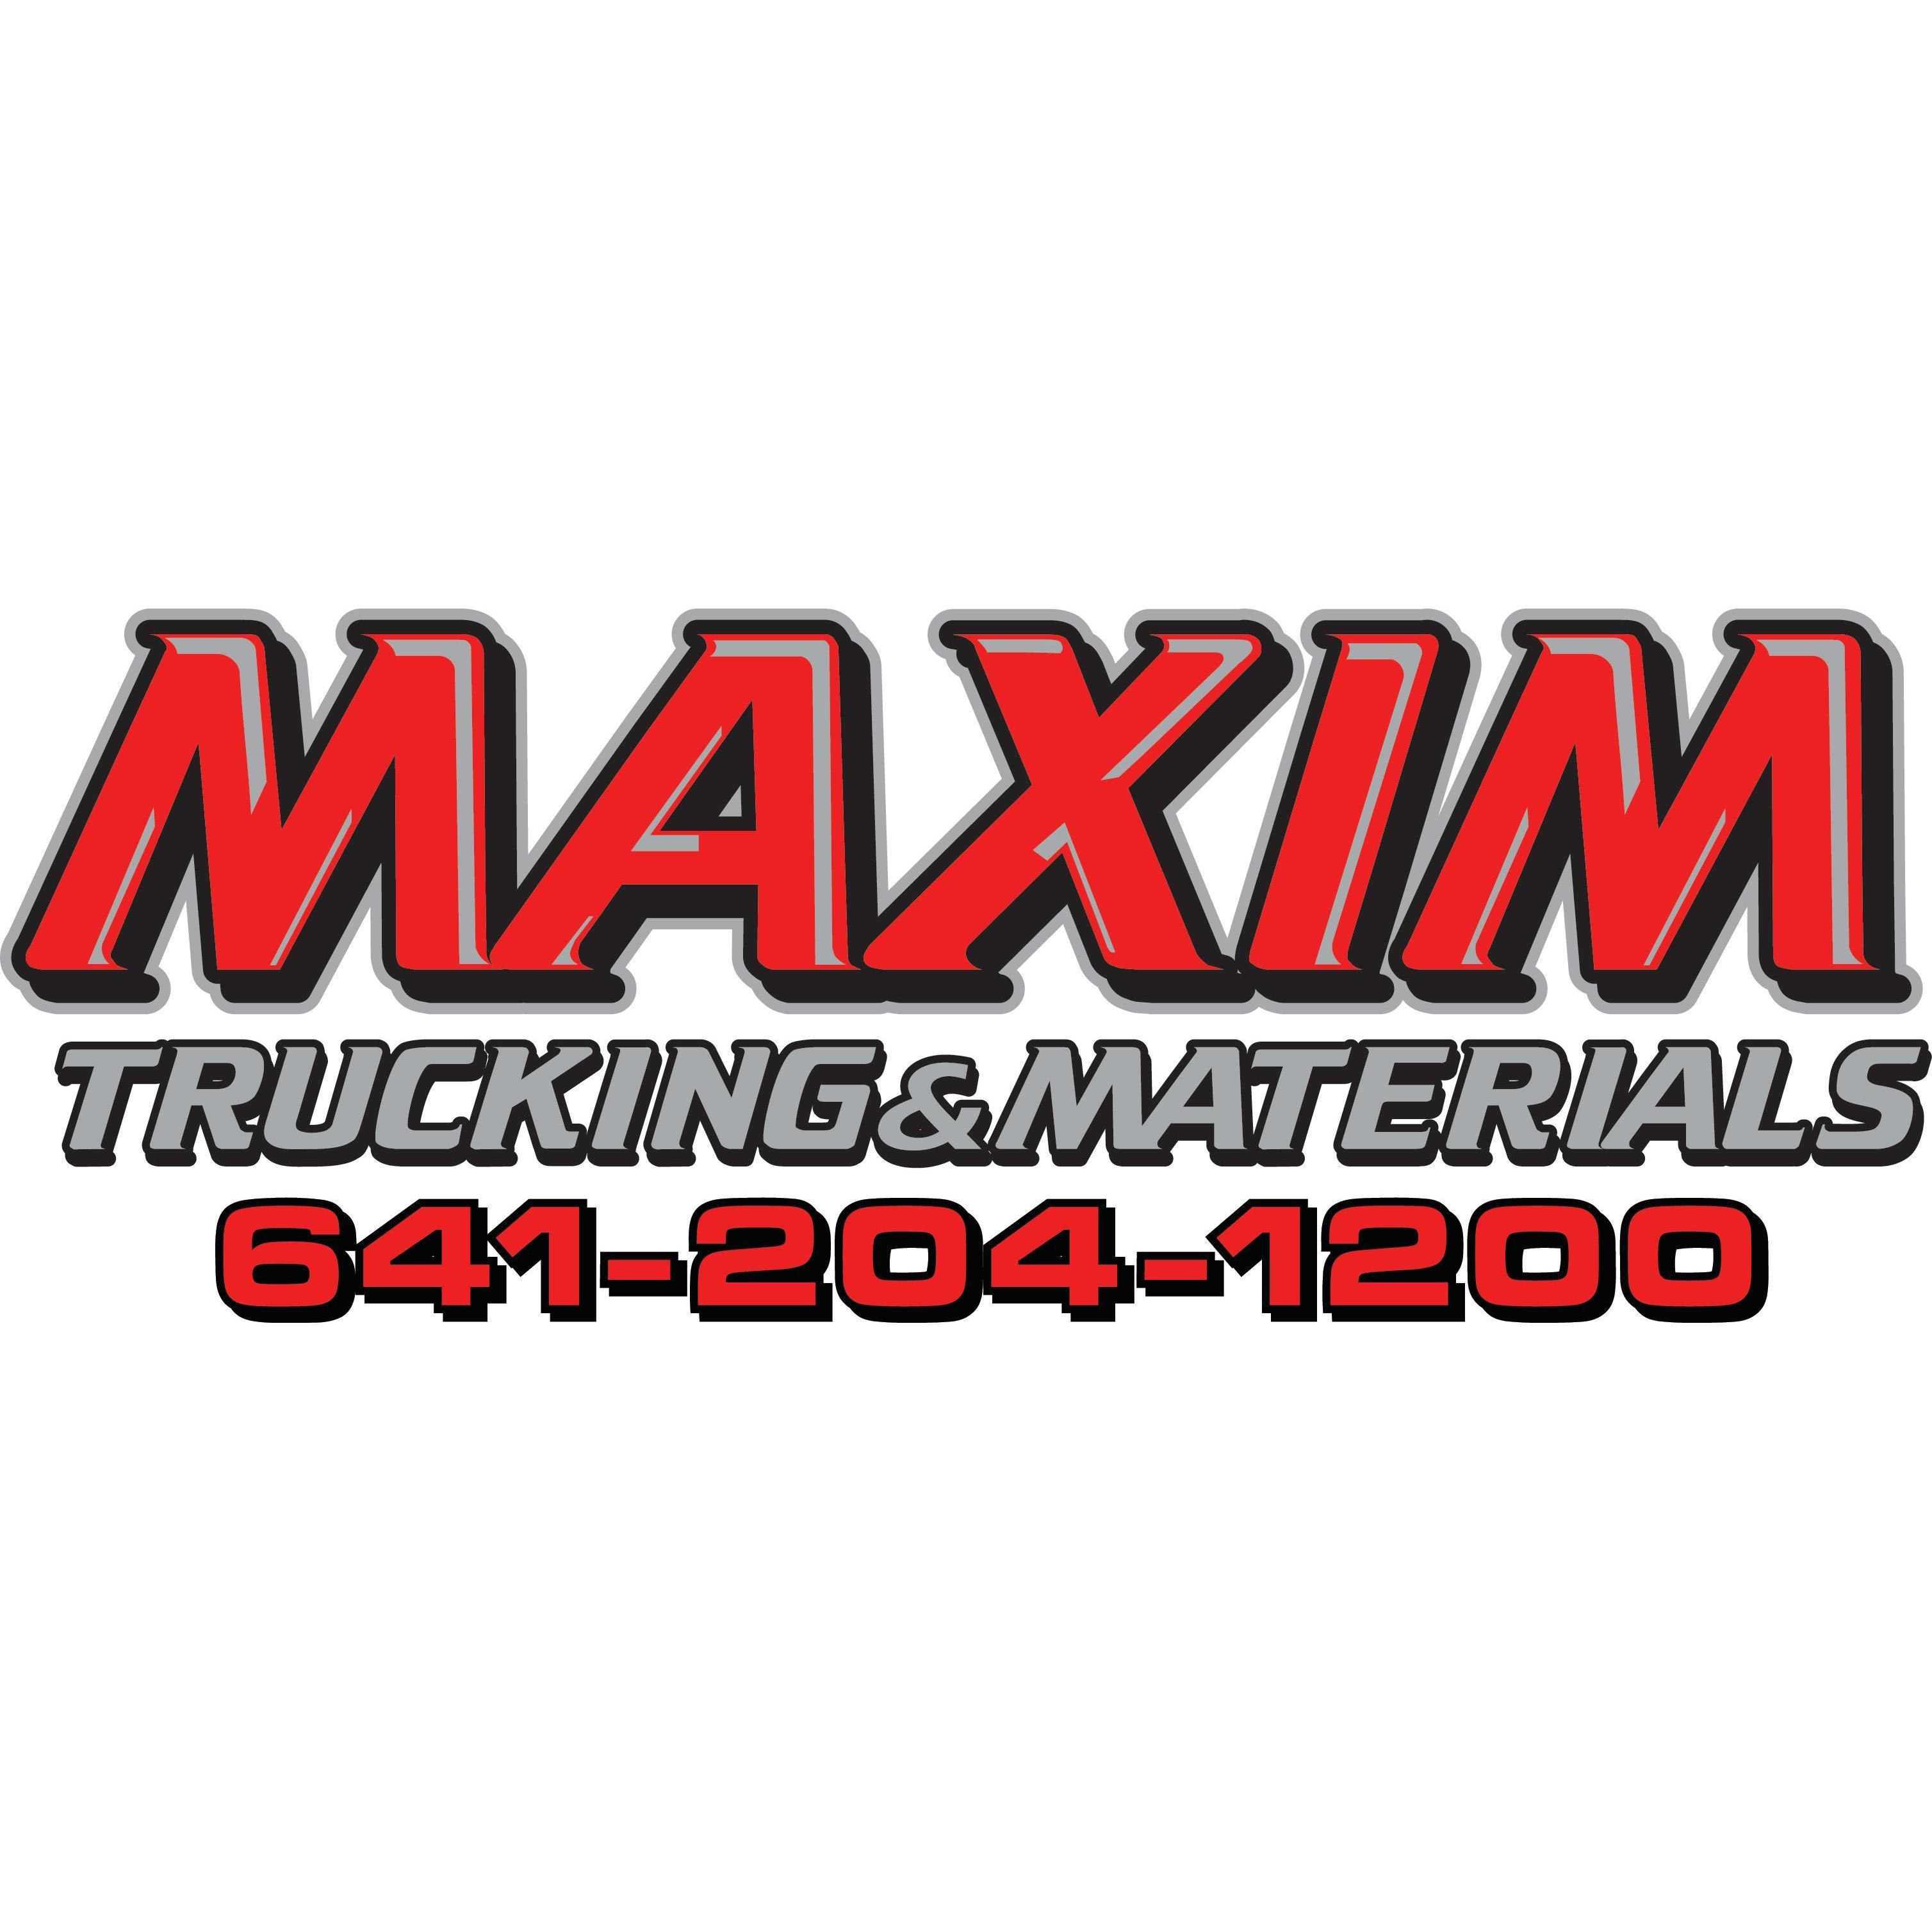 Maxim Trucking & Materials Inc. - Des Moines, IA - Concrete, Brick & Stone